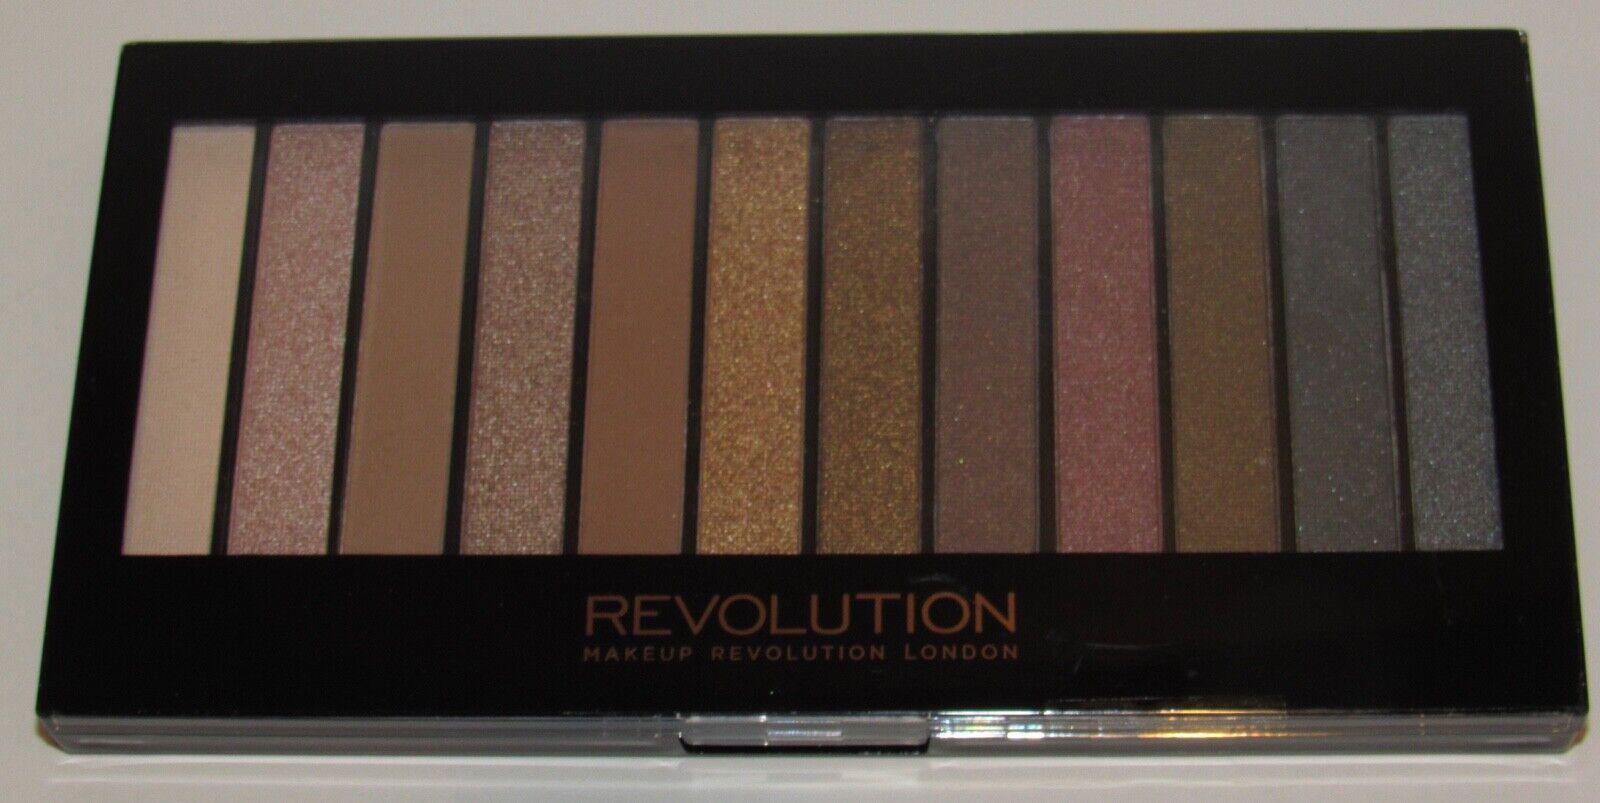 Makeup Revolution Redemption Eyeshadow Palette Iconic 1*Comp